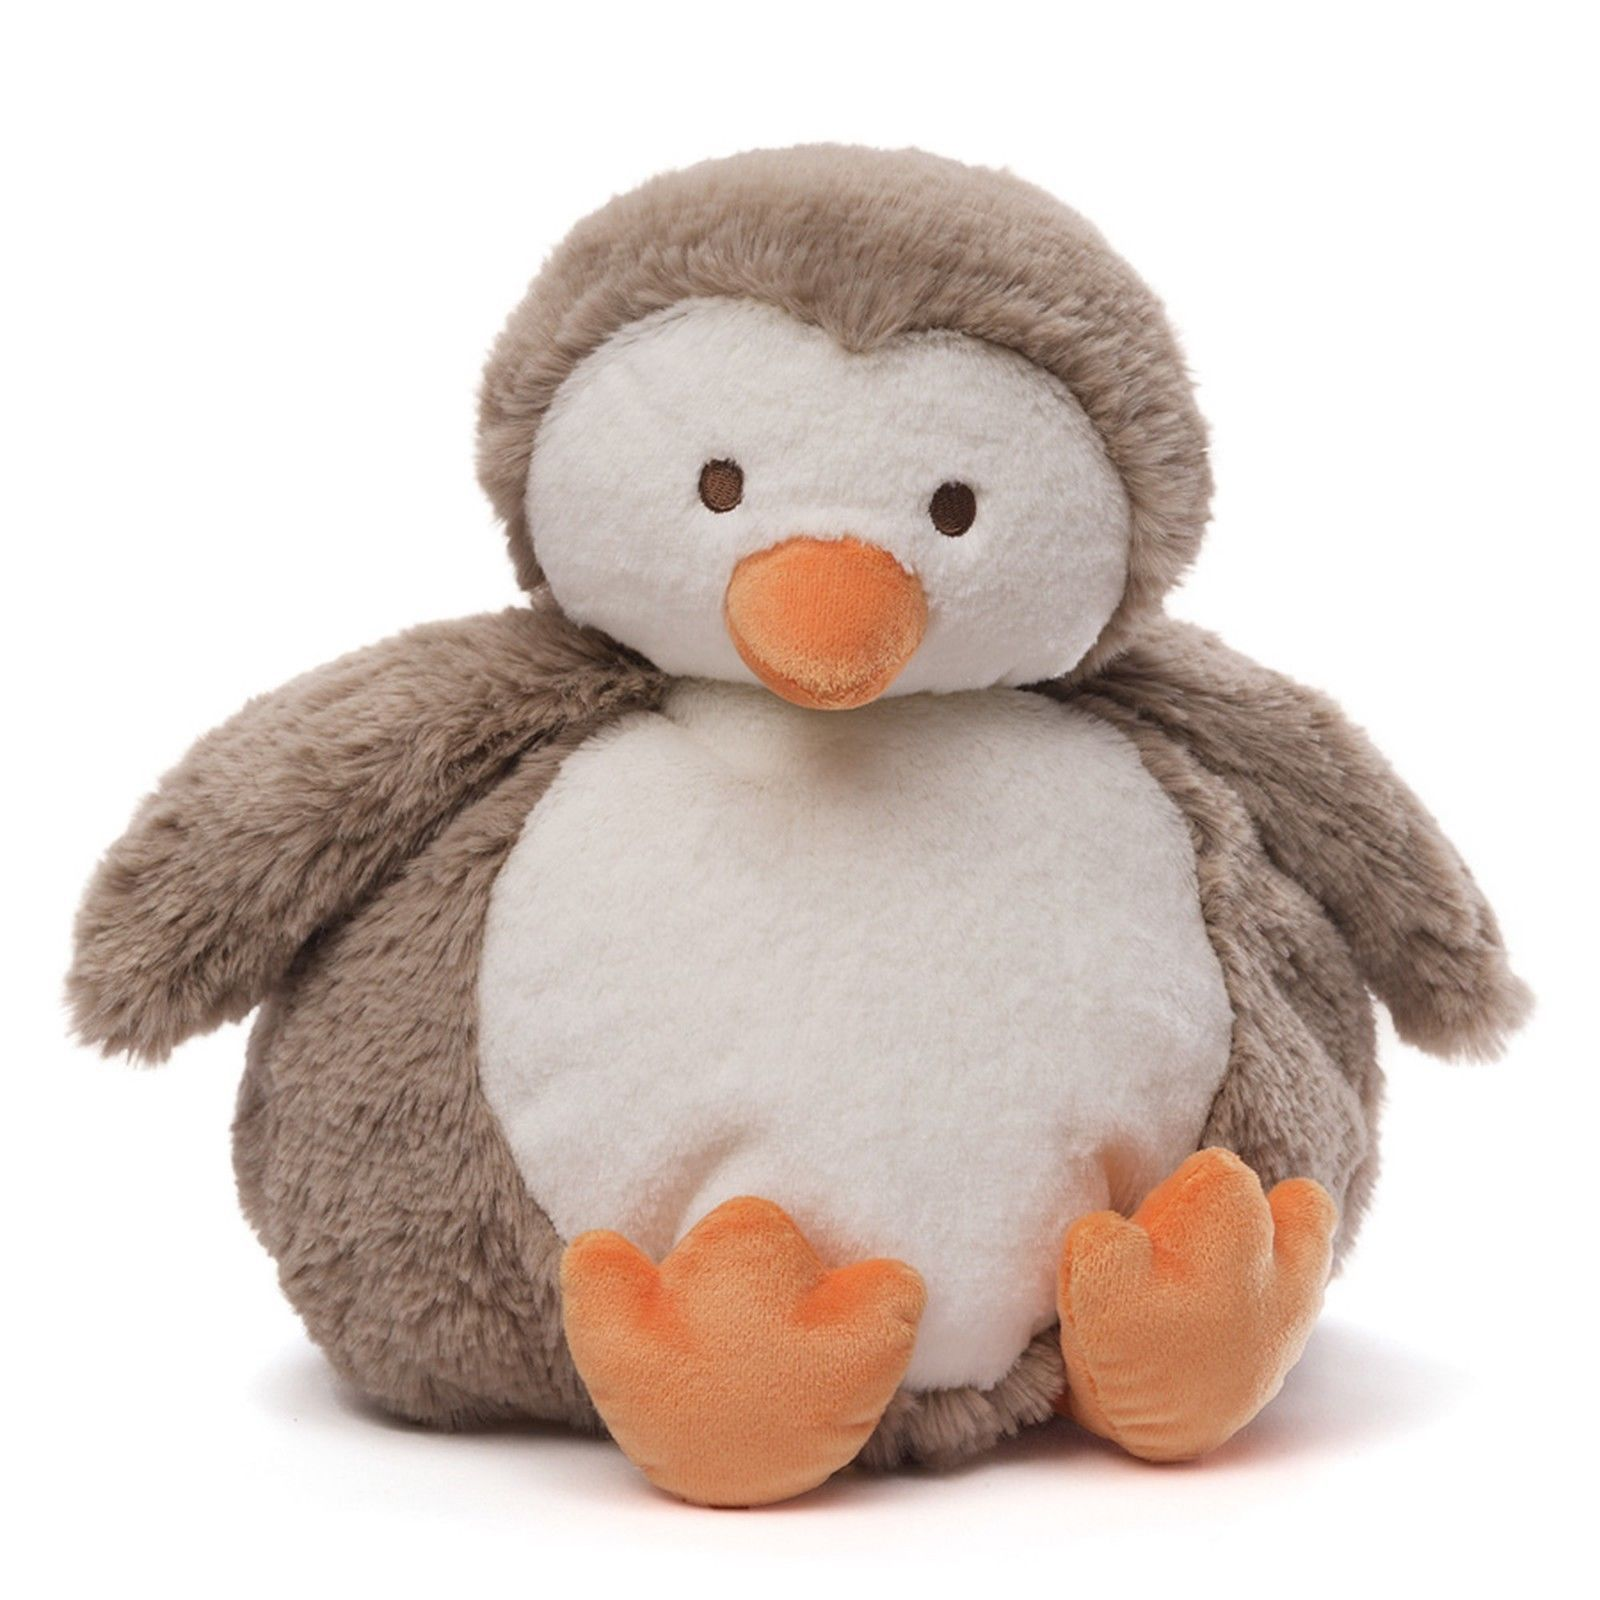 Gund 2598 Gund Stuffed Penguin Chub Baby Safe 10 Inches